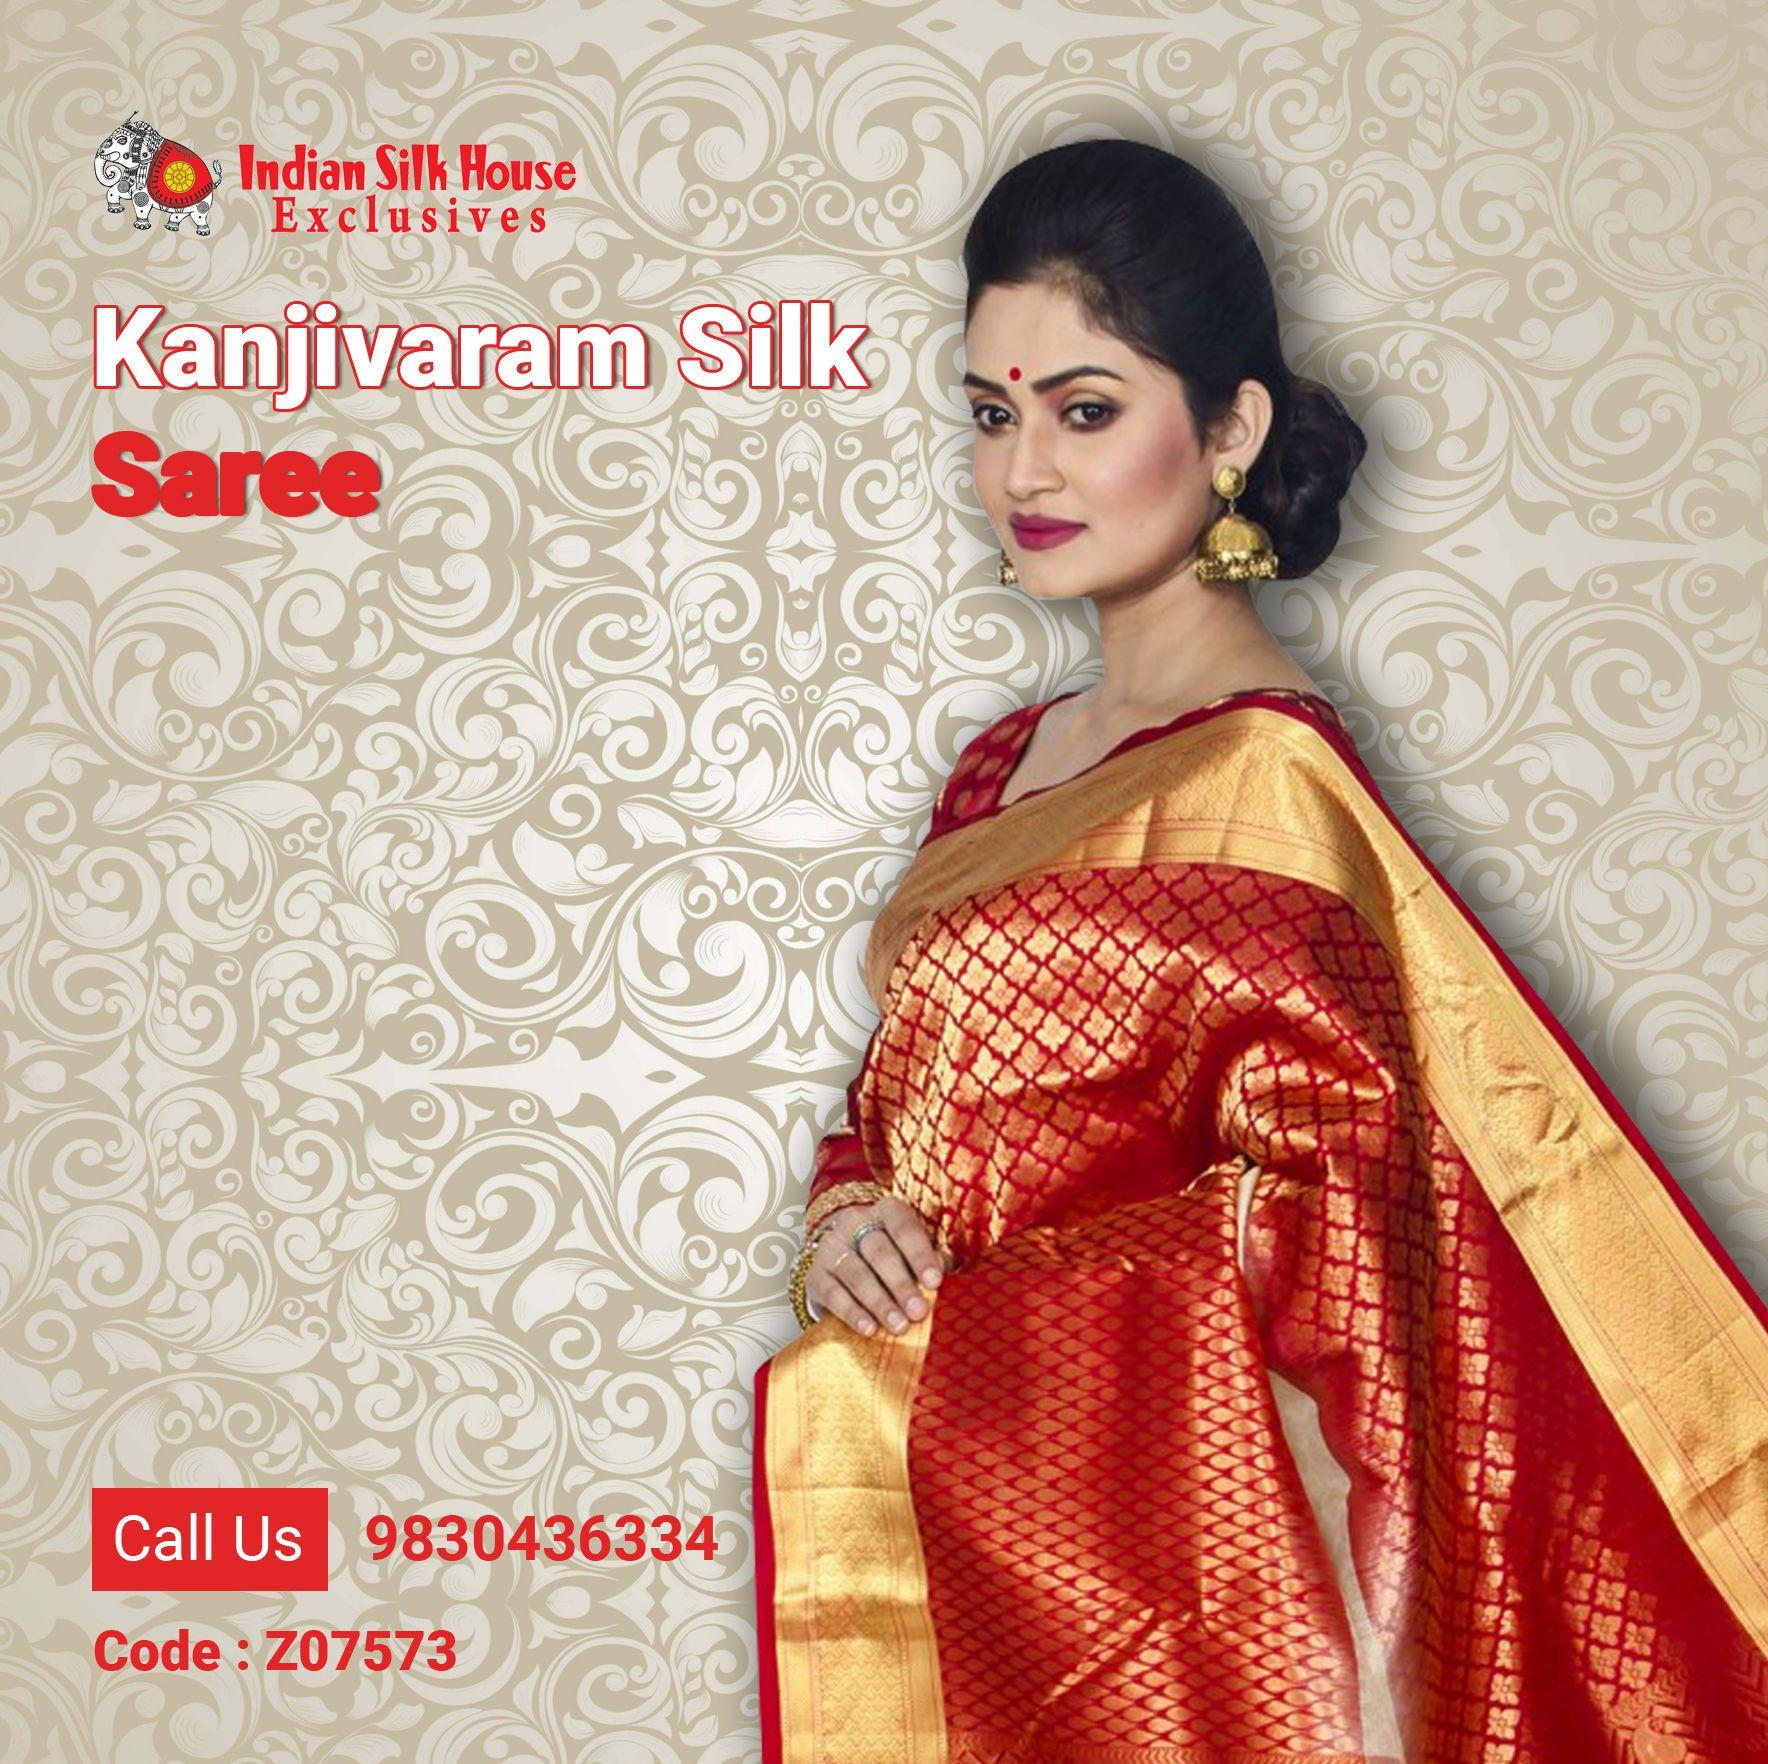 b8a235c68e6a33 Be the envy of others with this fantastic red and white Kanjivaran silk  saree. #Kanjivaram, #sarees, #SilkSaree